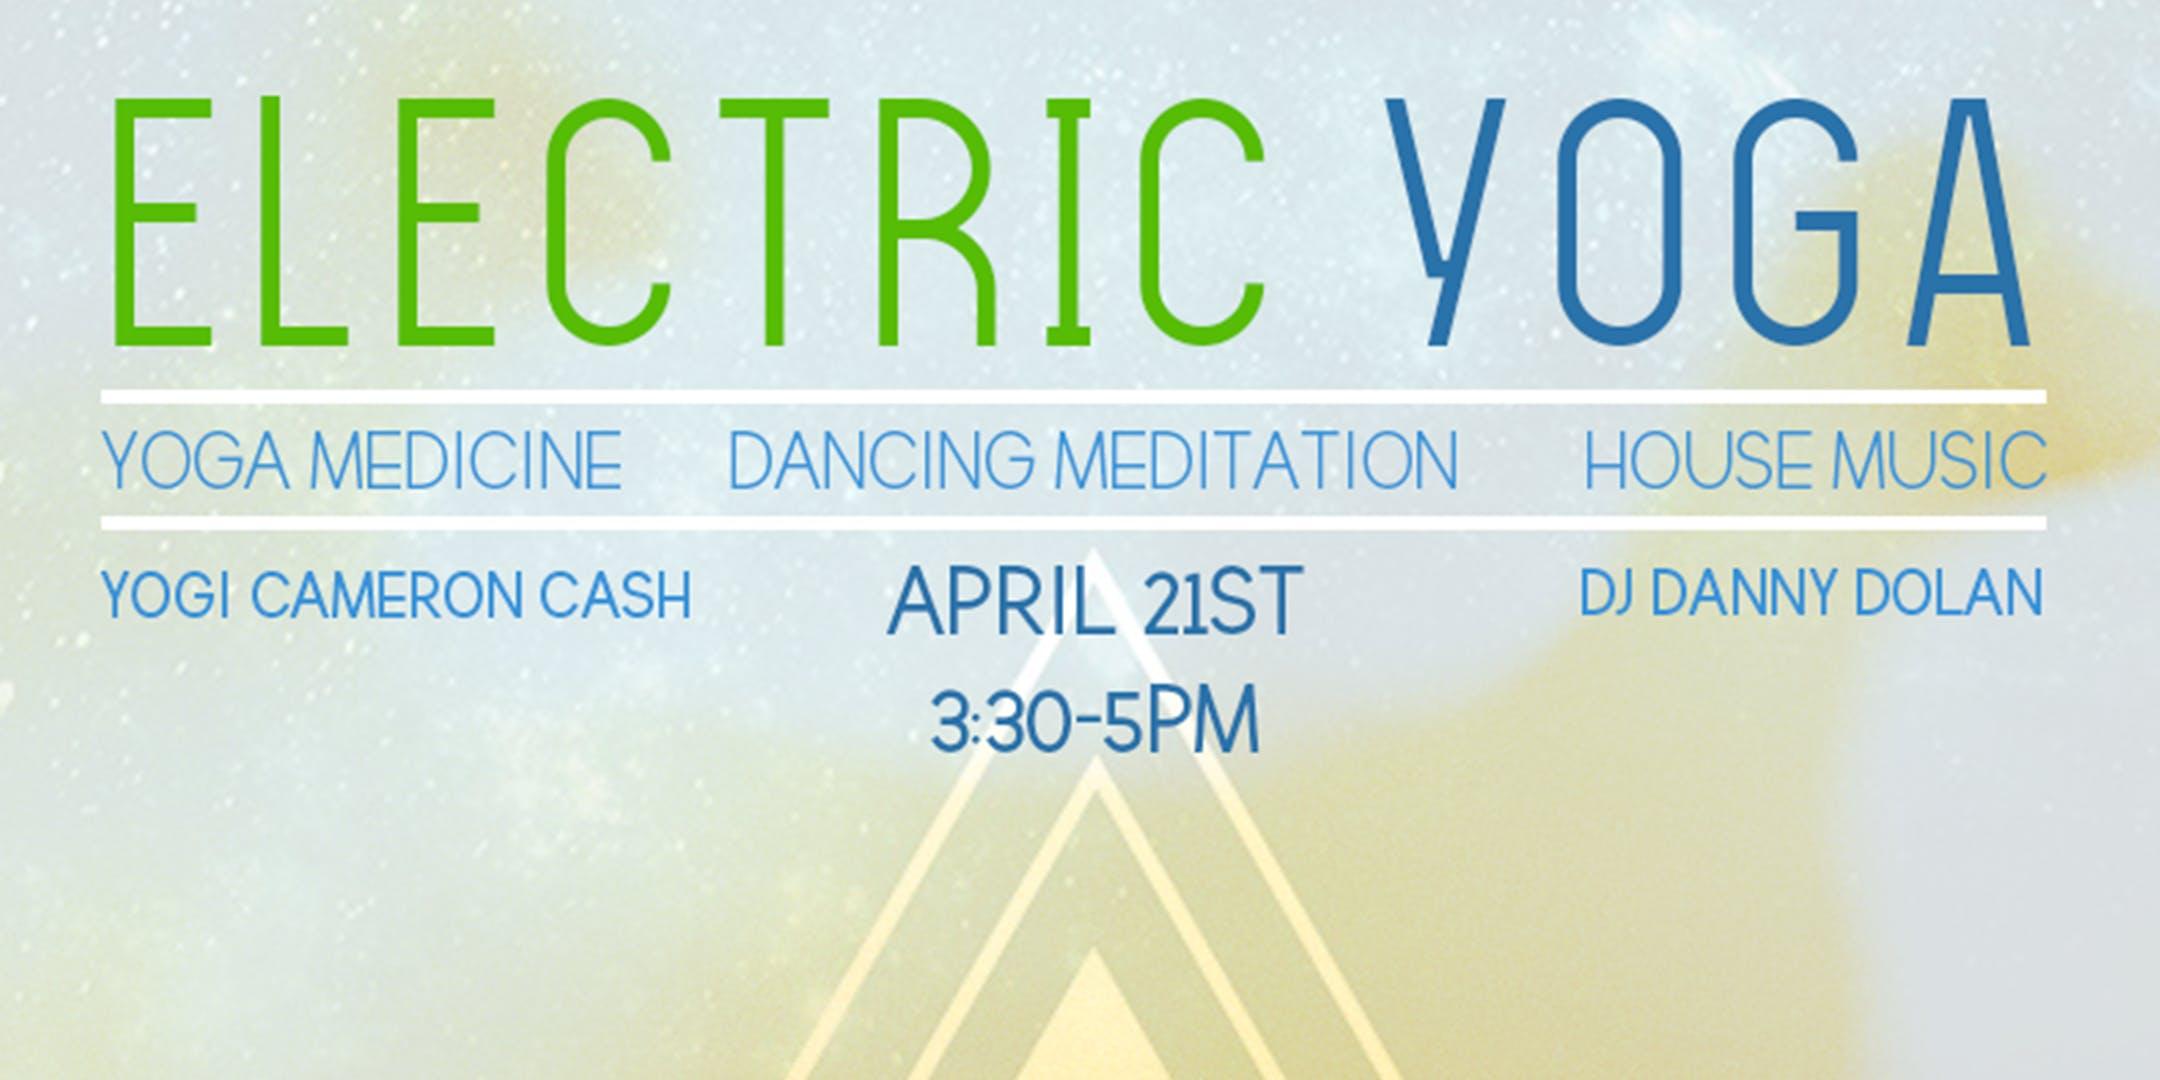 Electric Yoga - April 21st